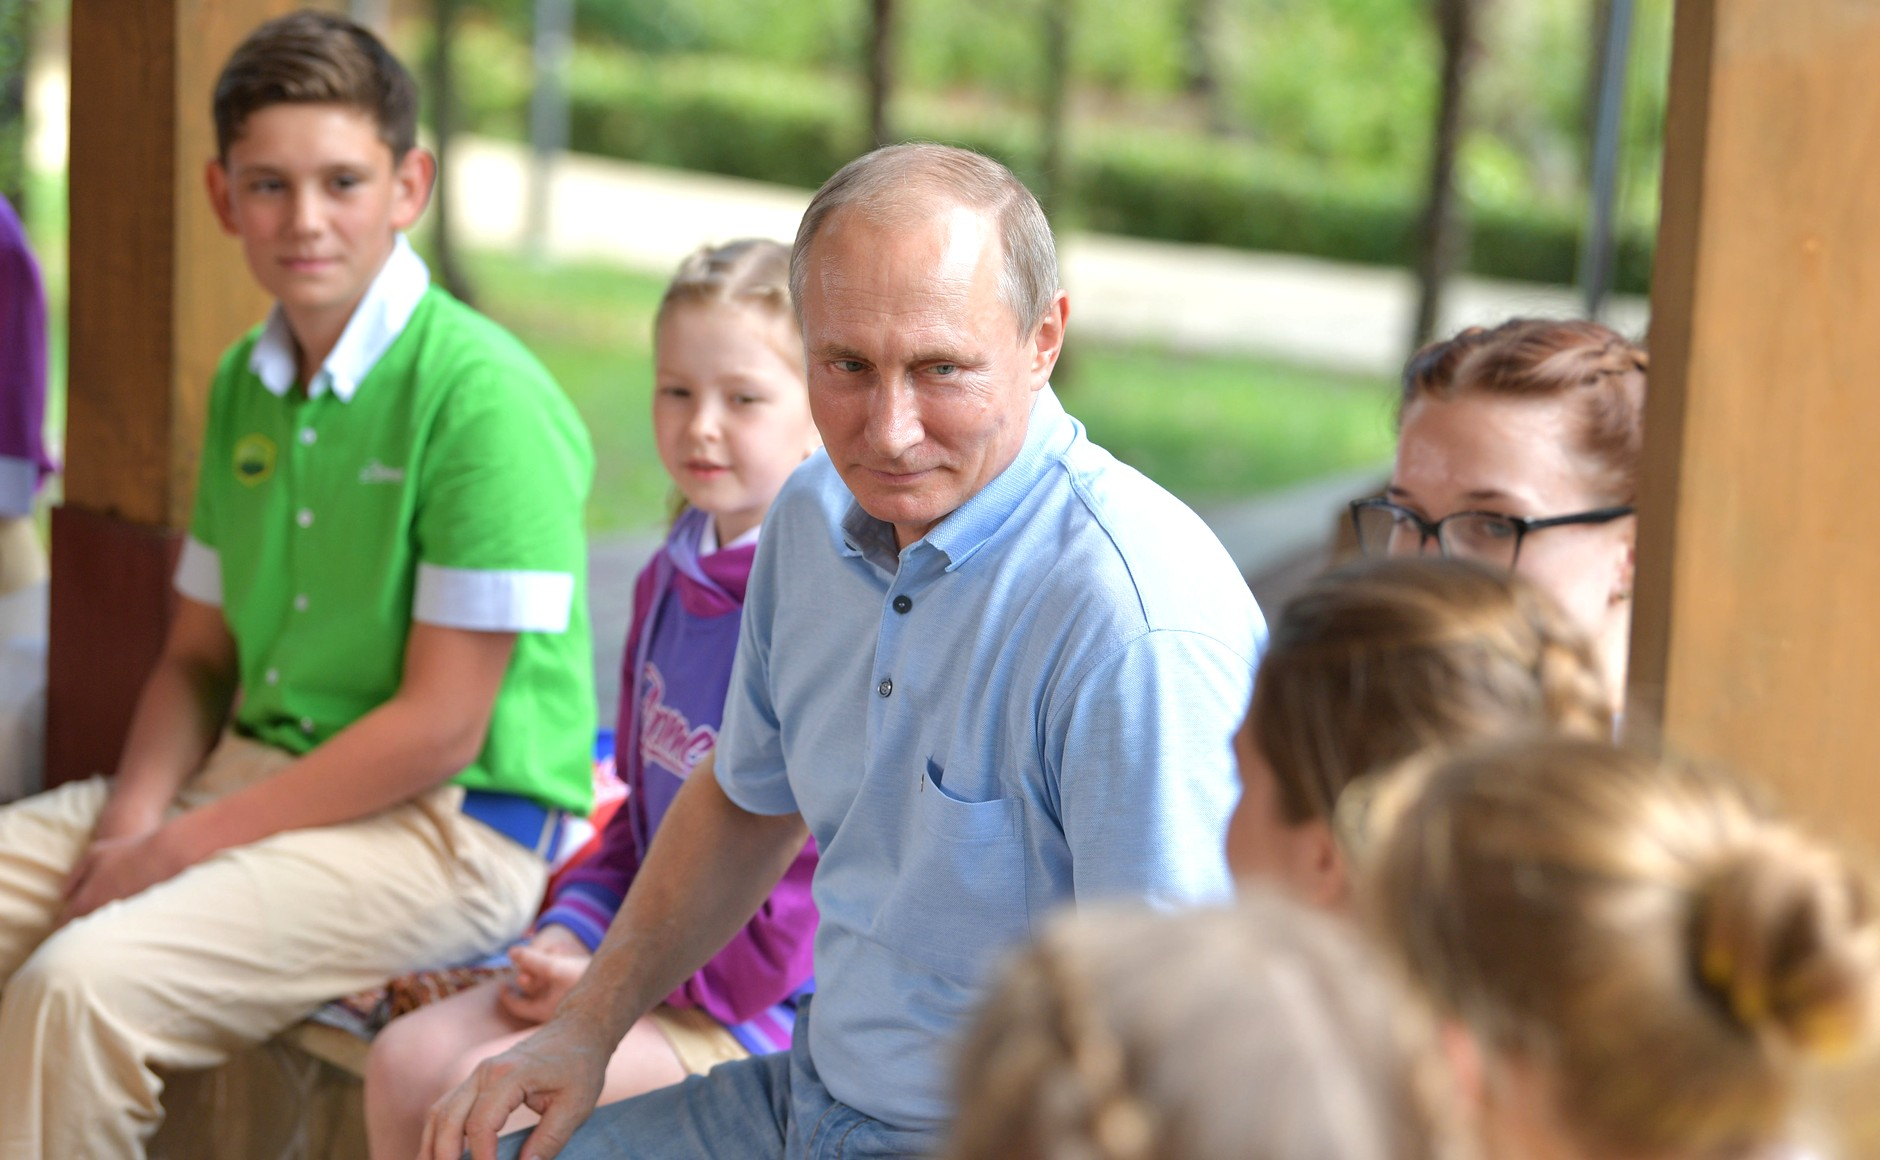 Putin with kids